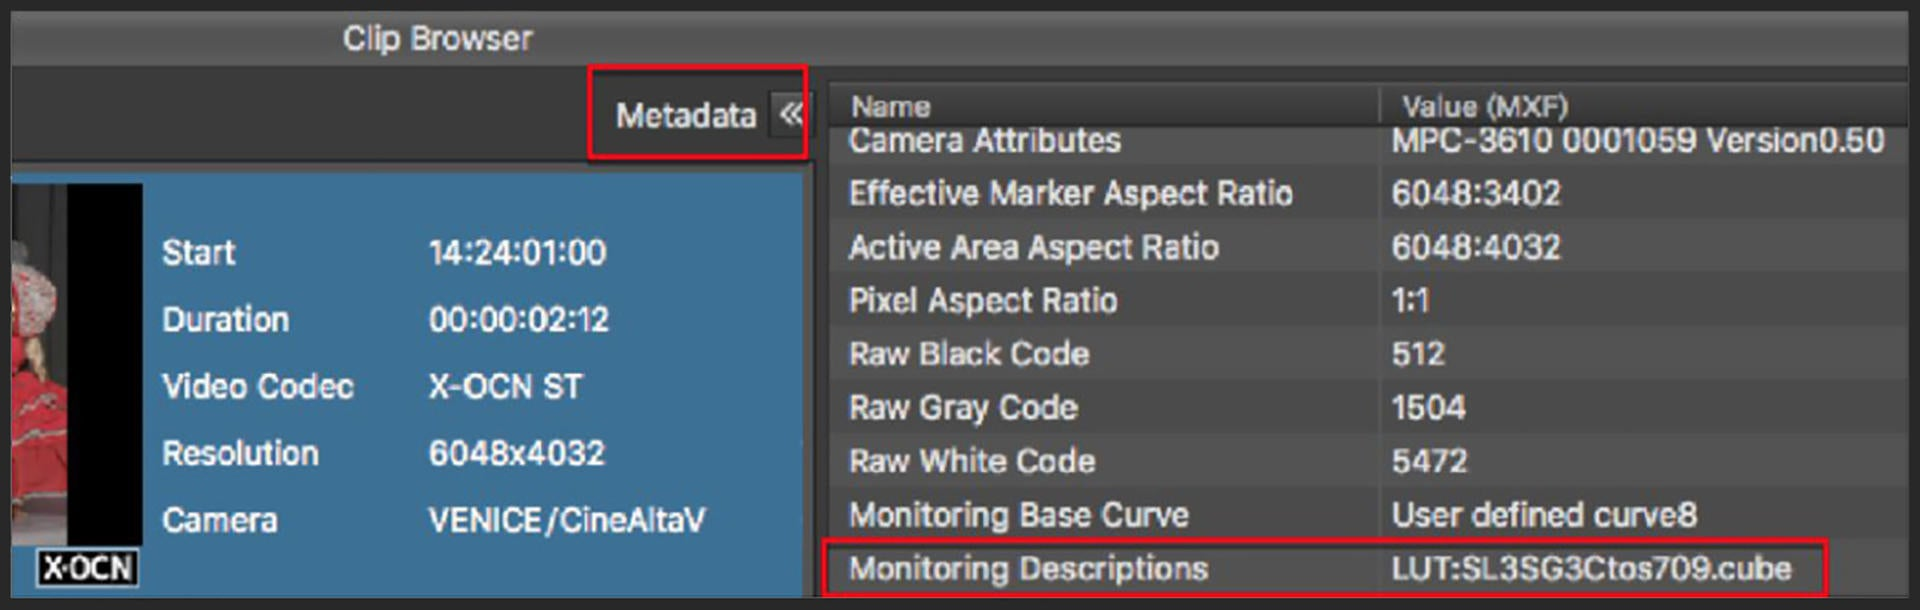 Metadata-2.jpg